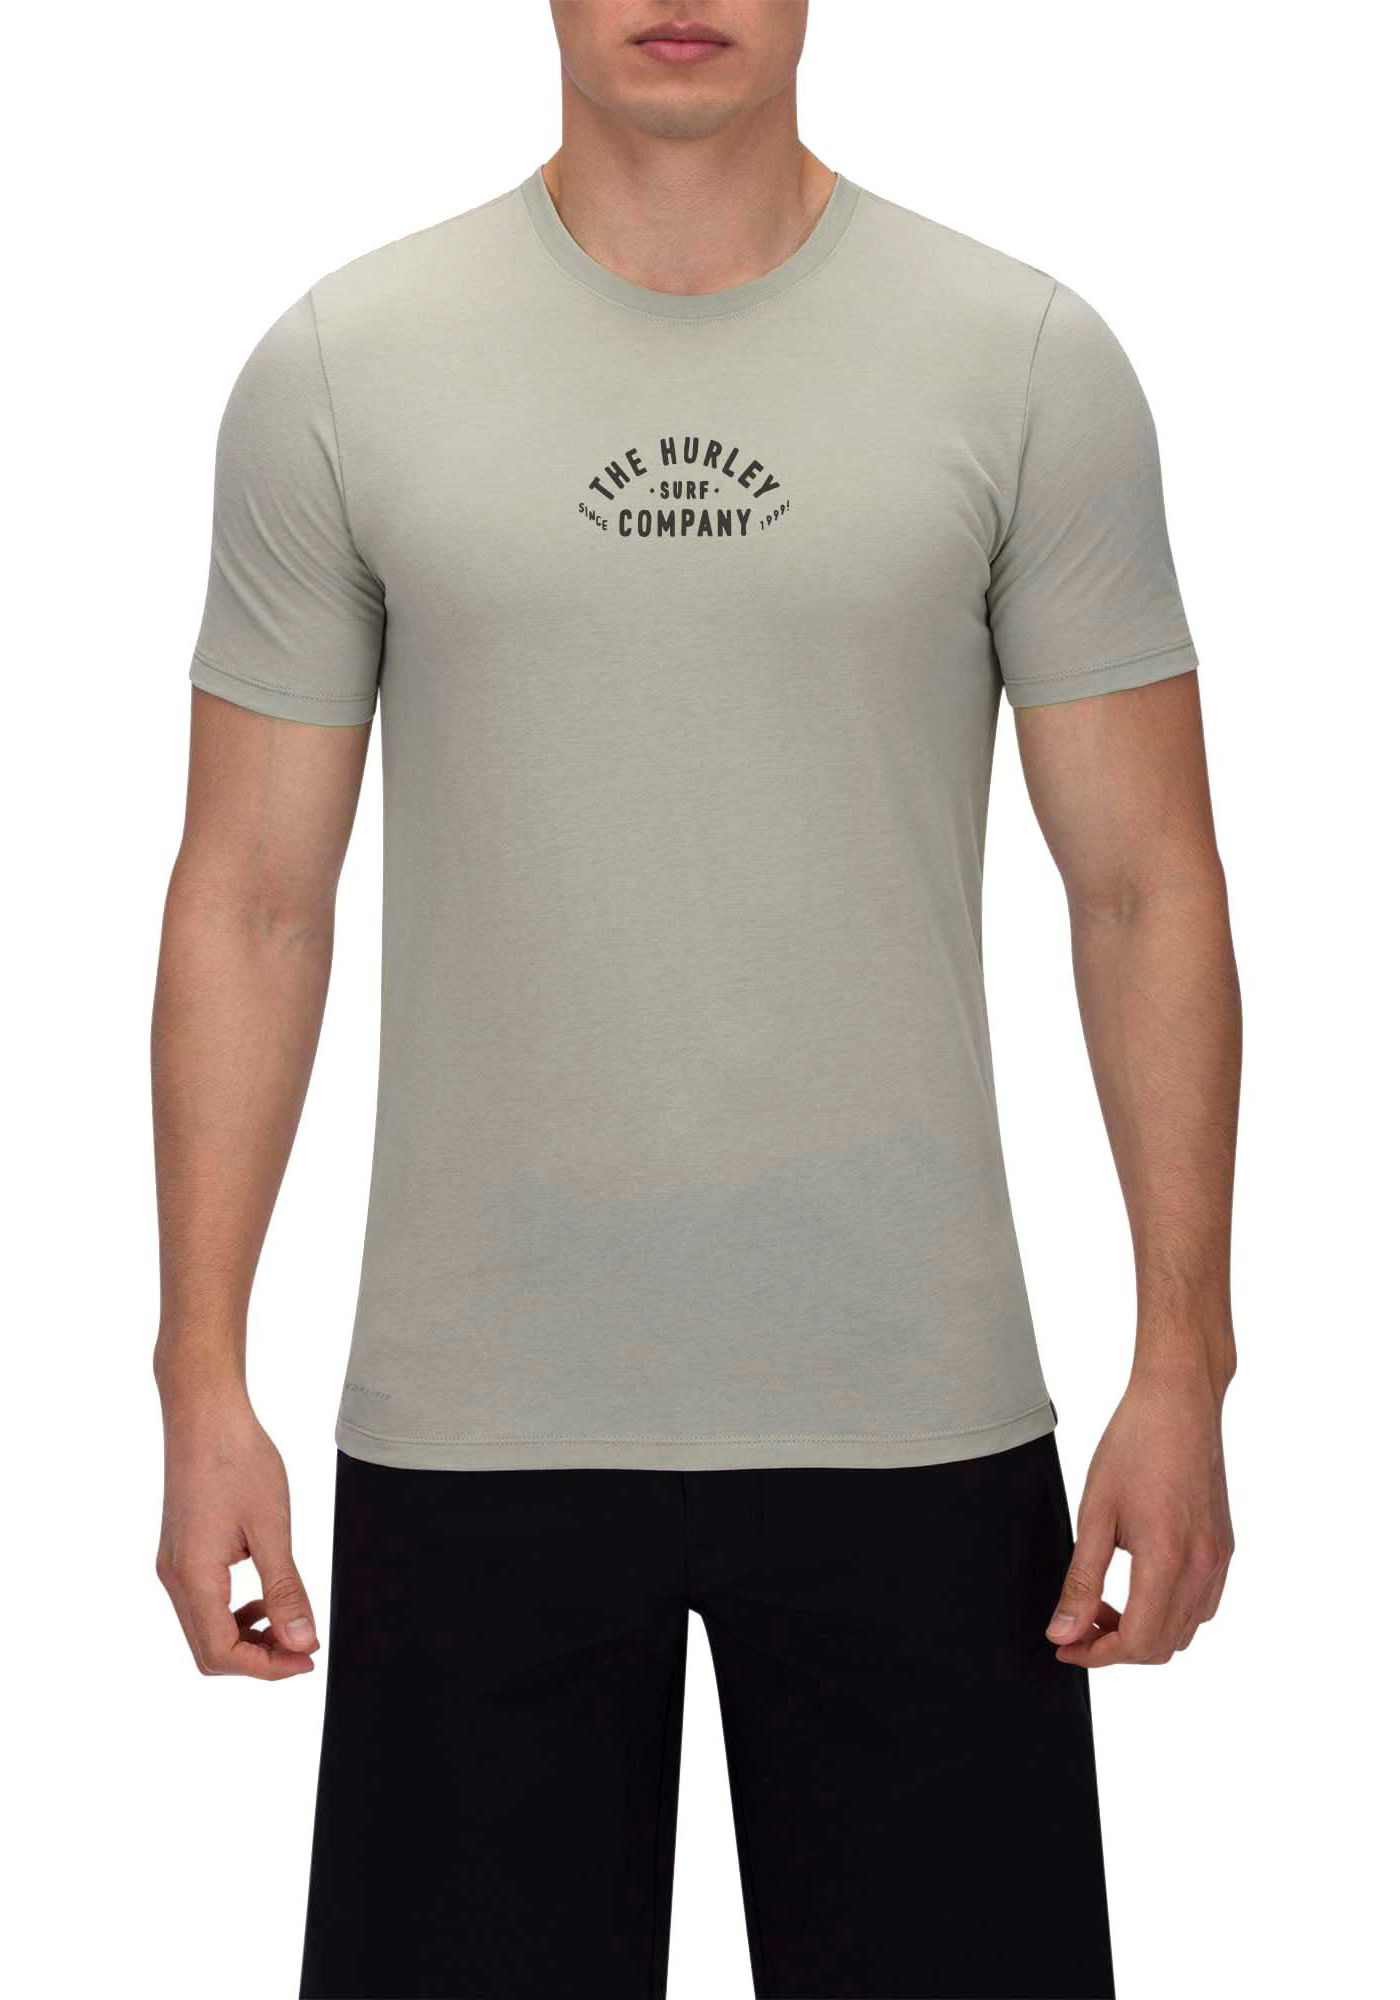 Hurley Men's Dri-FIT 3rd Base Short Sleeve T-Shirt